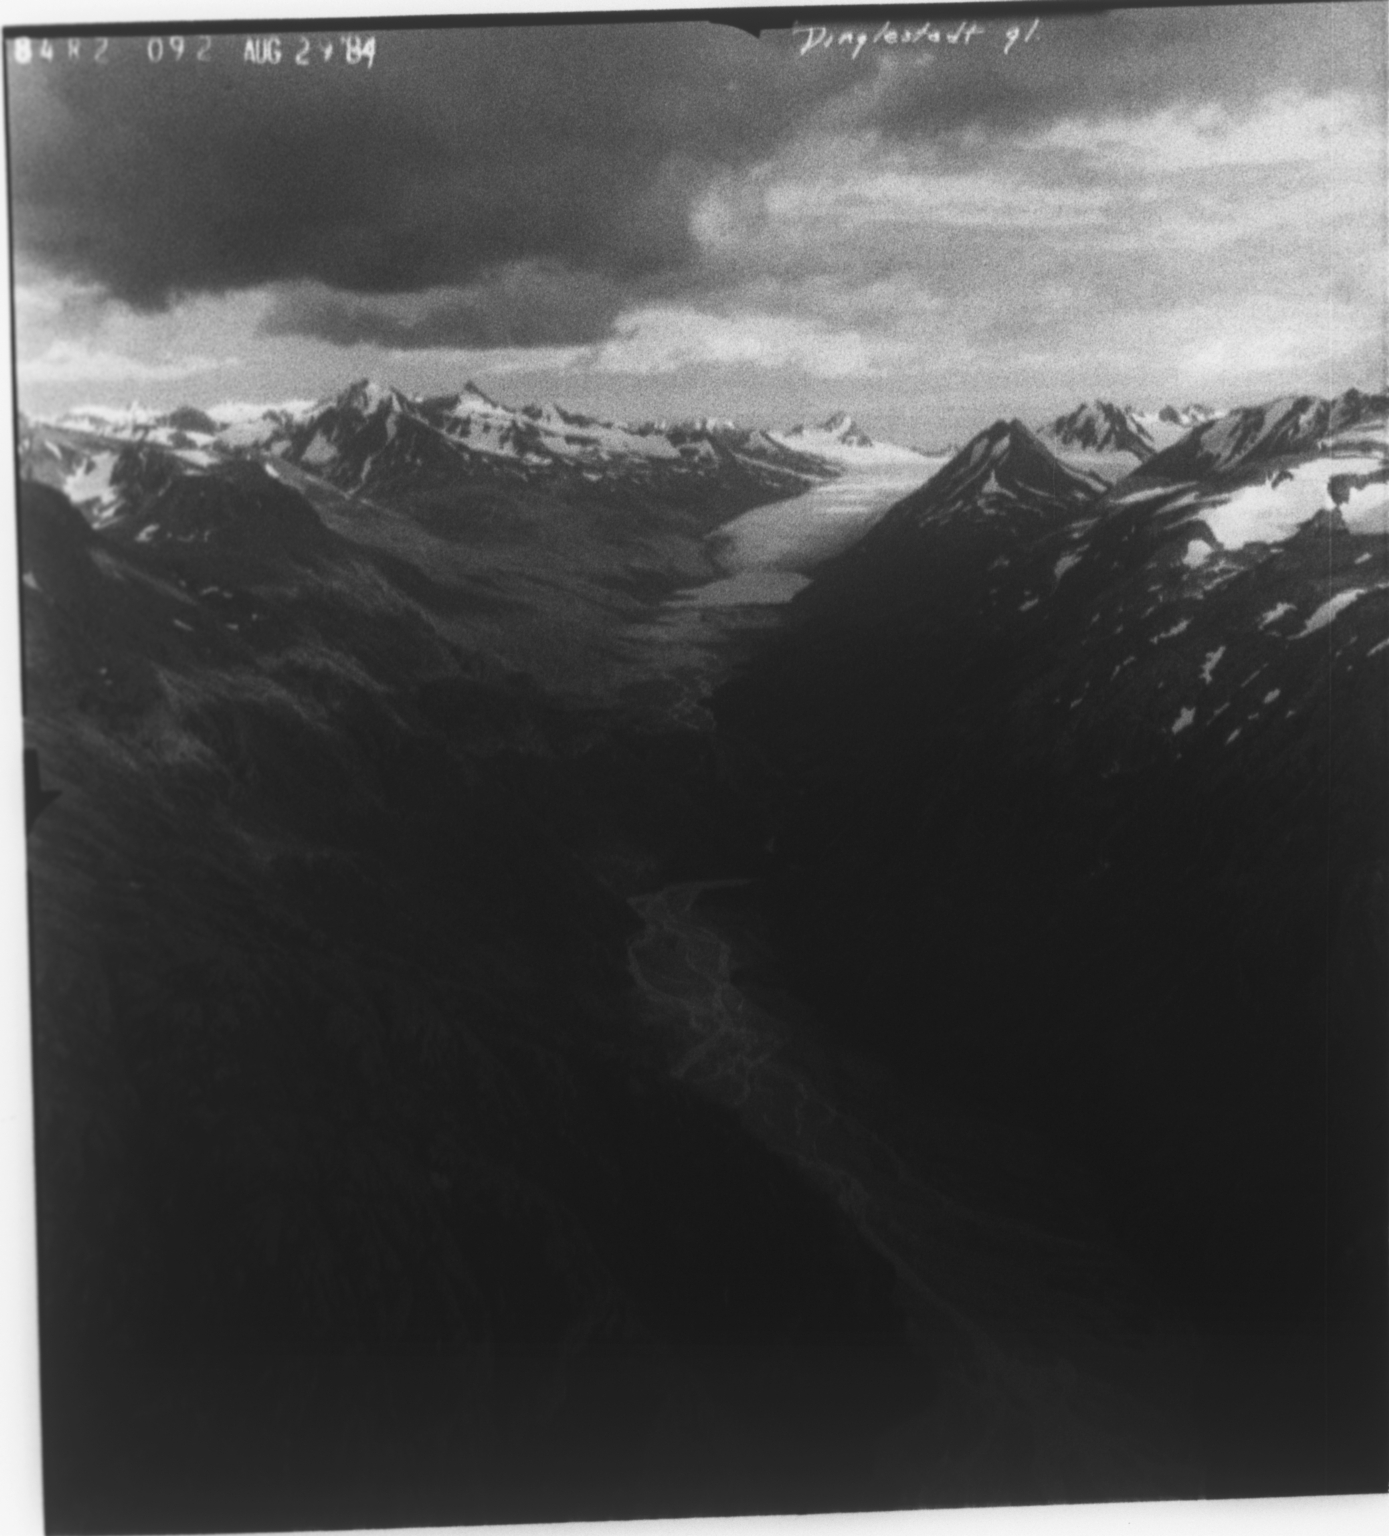 Dinglestadt Glacier, Alaska, United States